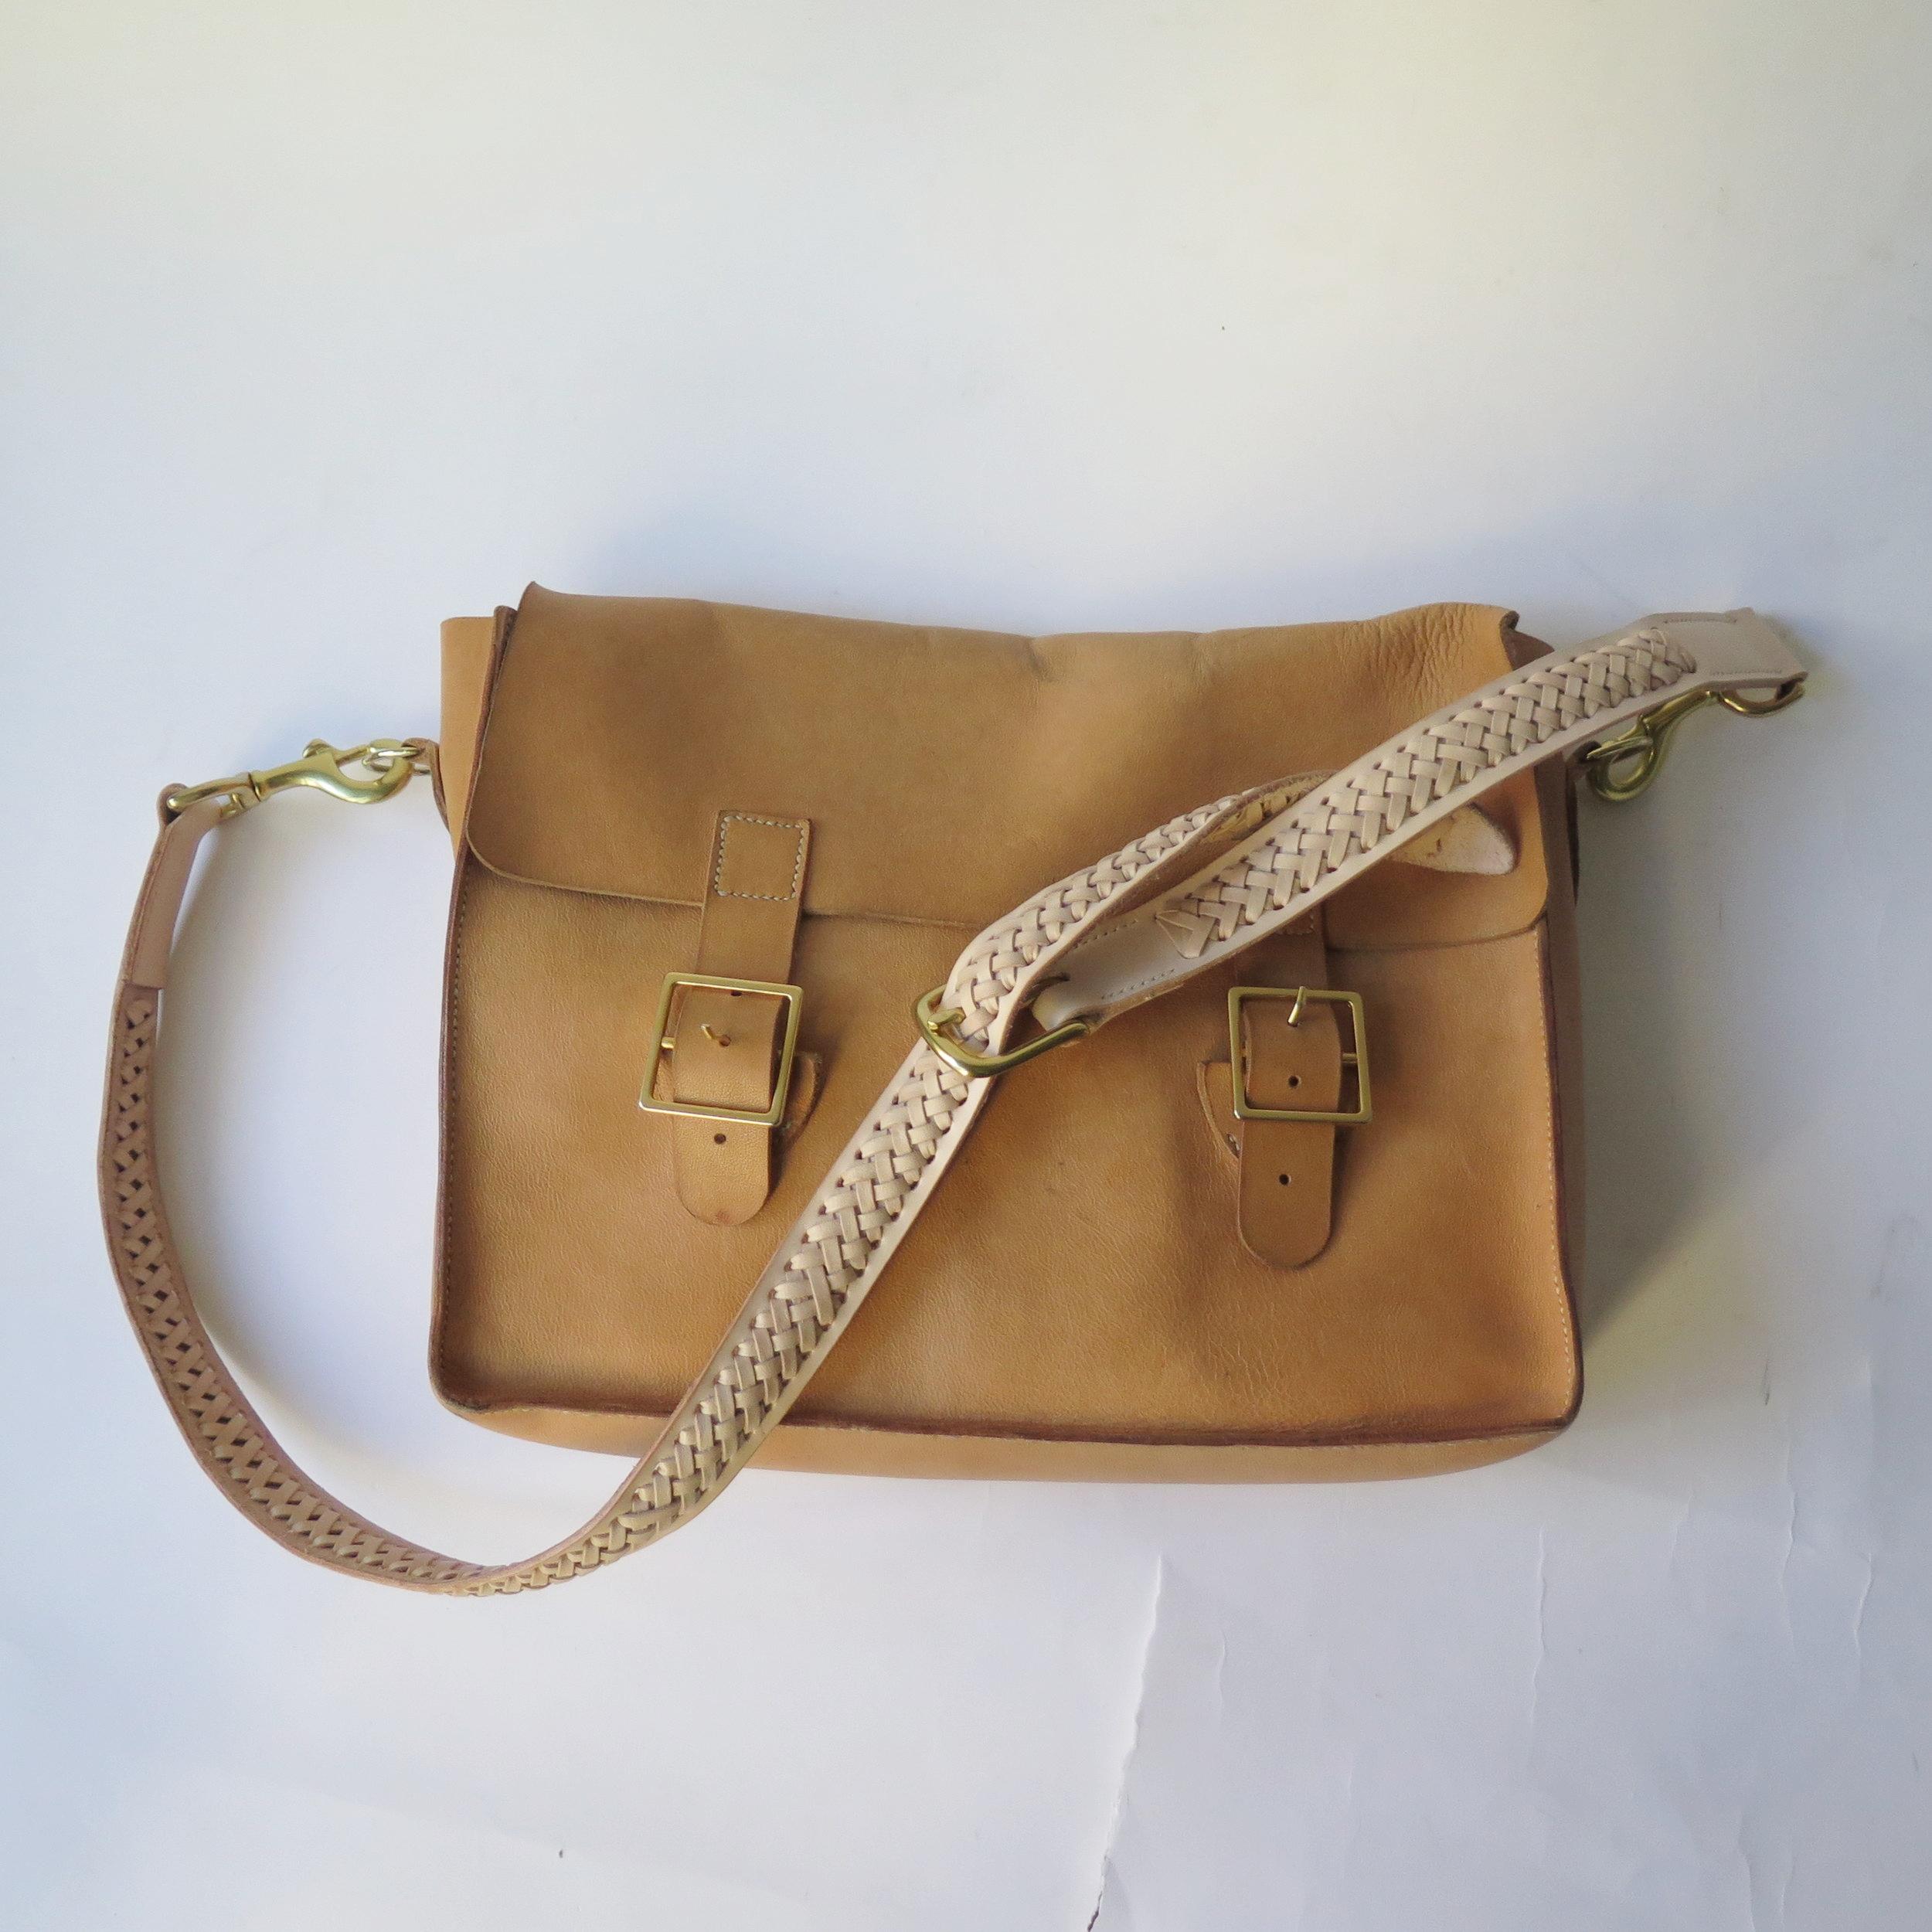 Mary-Savel-Bucky-Bag-Leather-handbag-saddle-stitch.6.JPG